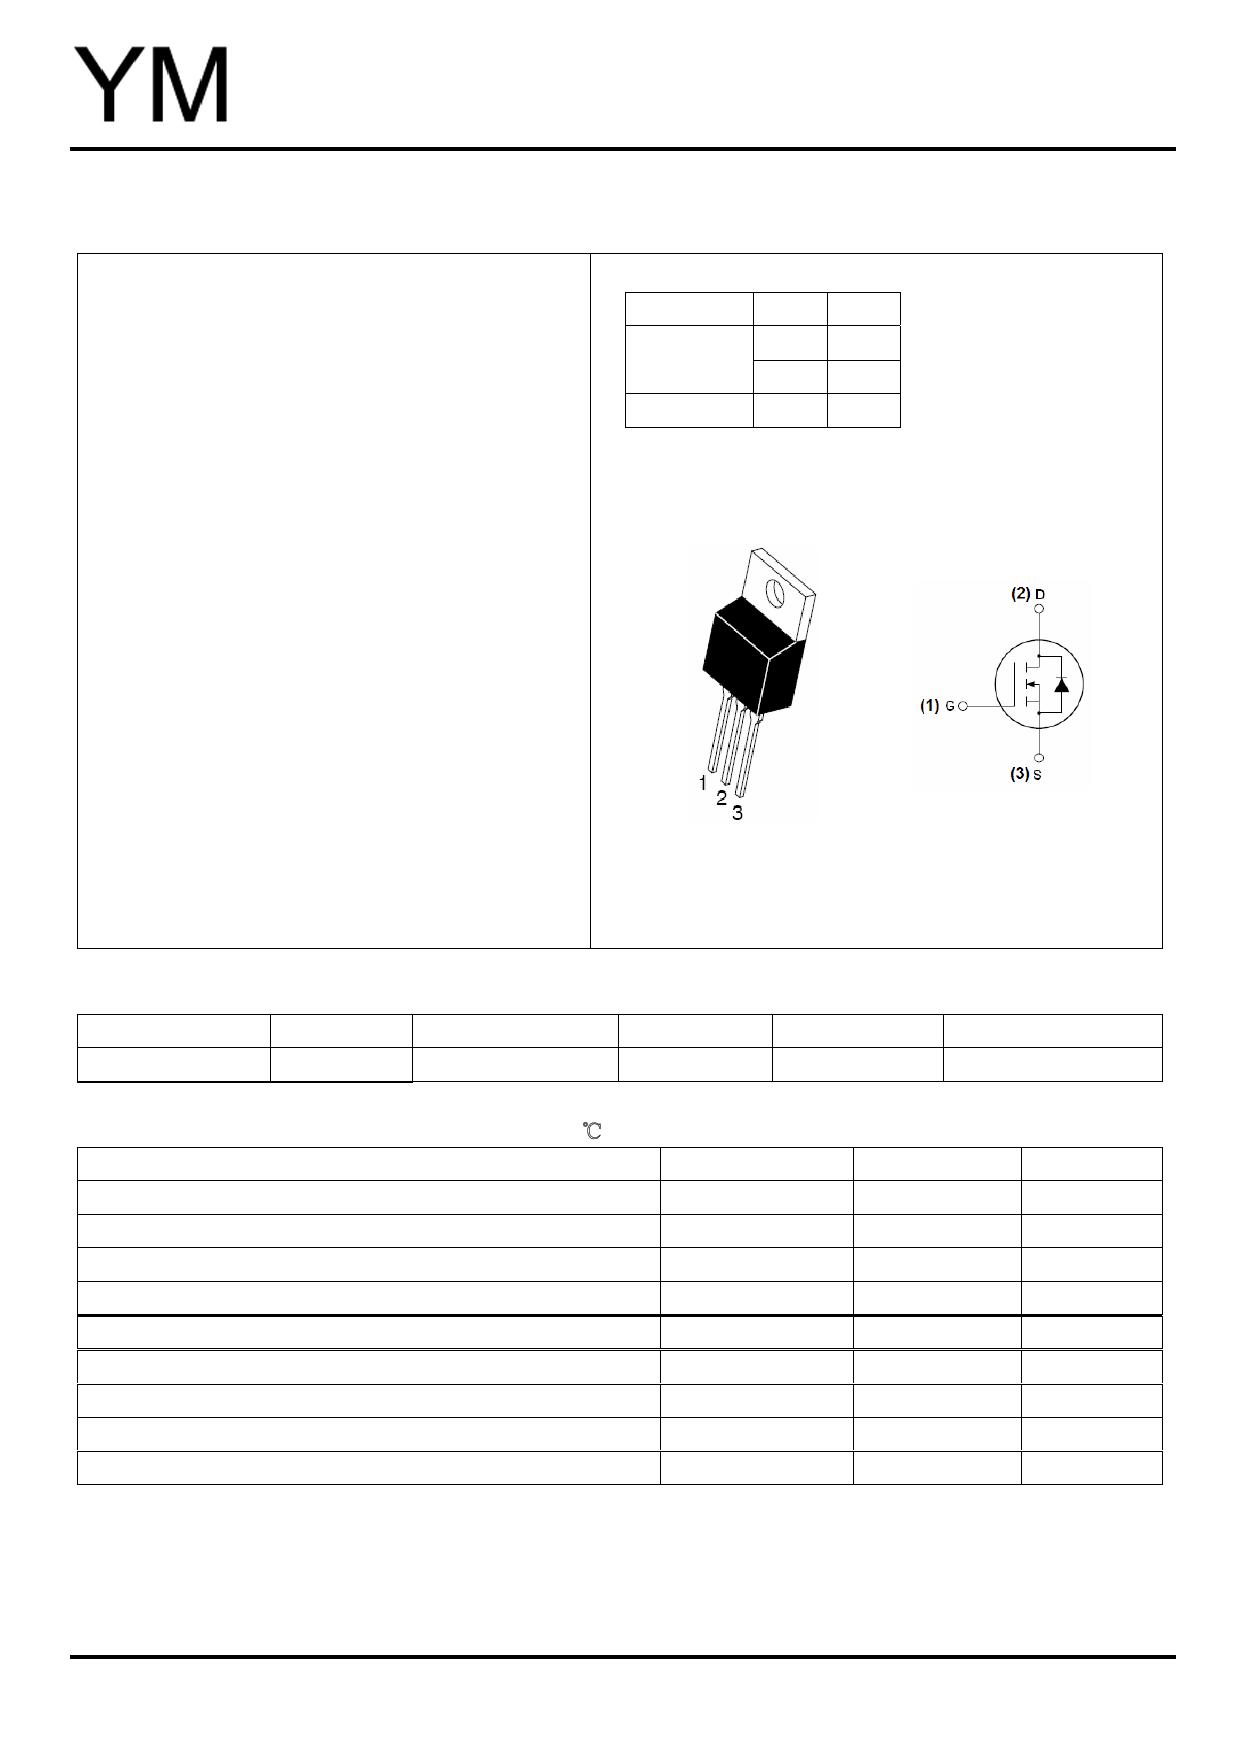 YMP120N06 datasheet